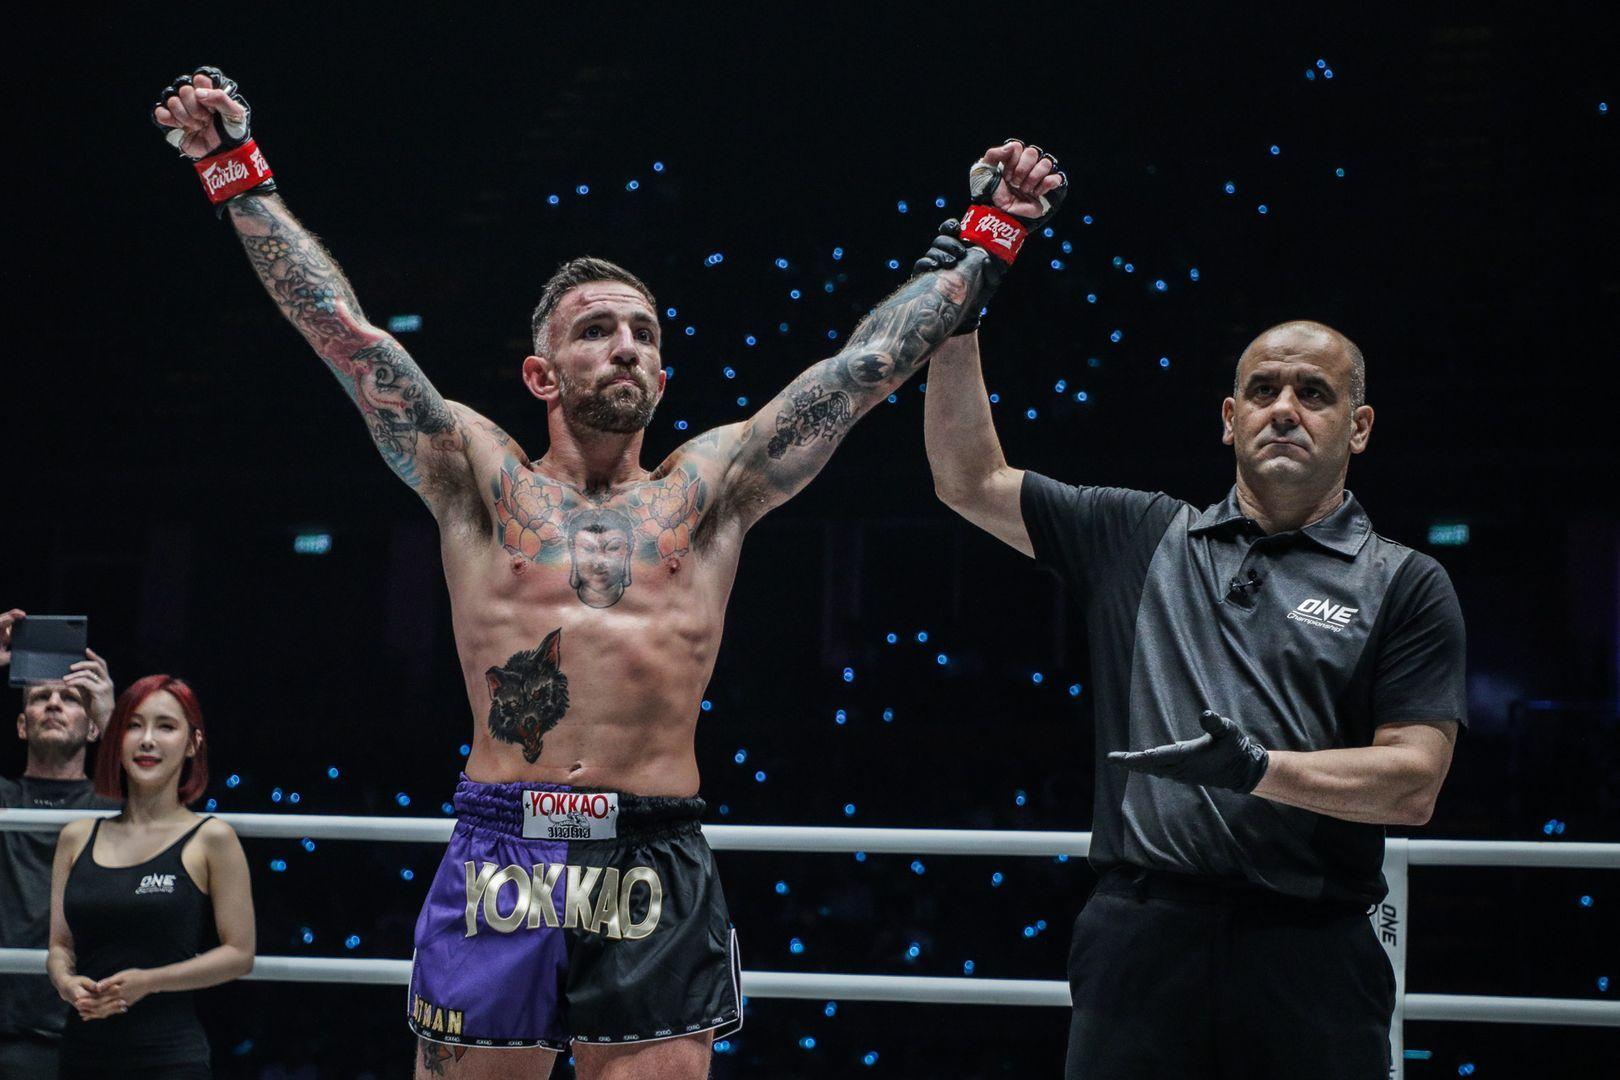 Liam Harrison defeats VS Mohammed Bin Mahmoud at ONE A NEW TOMORROW